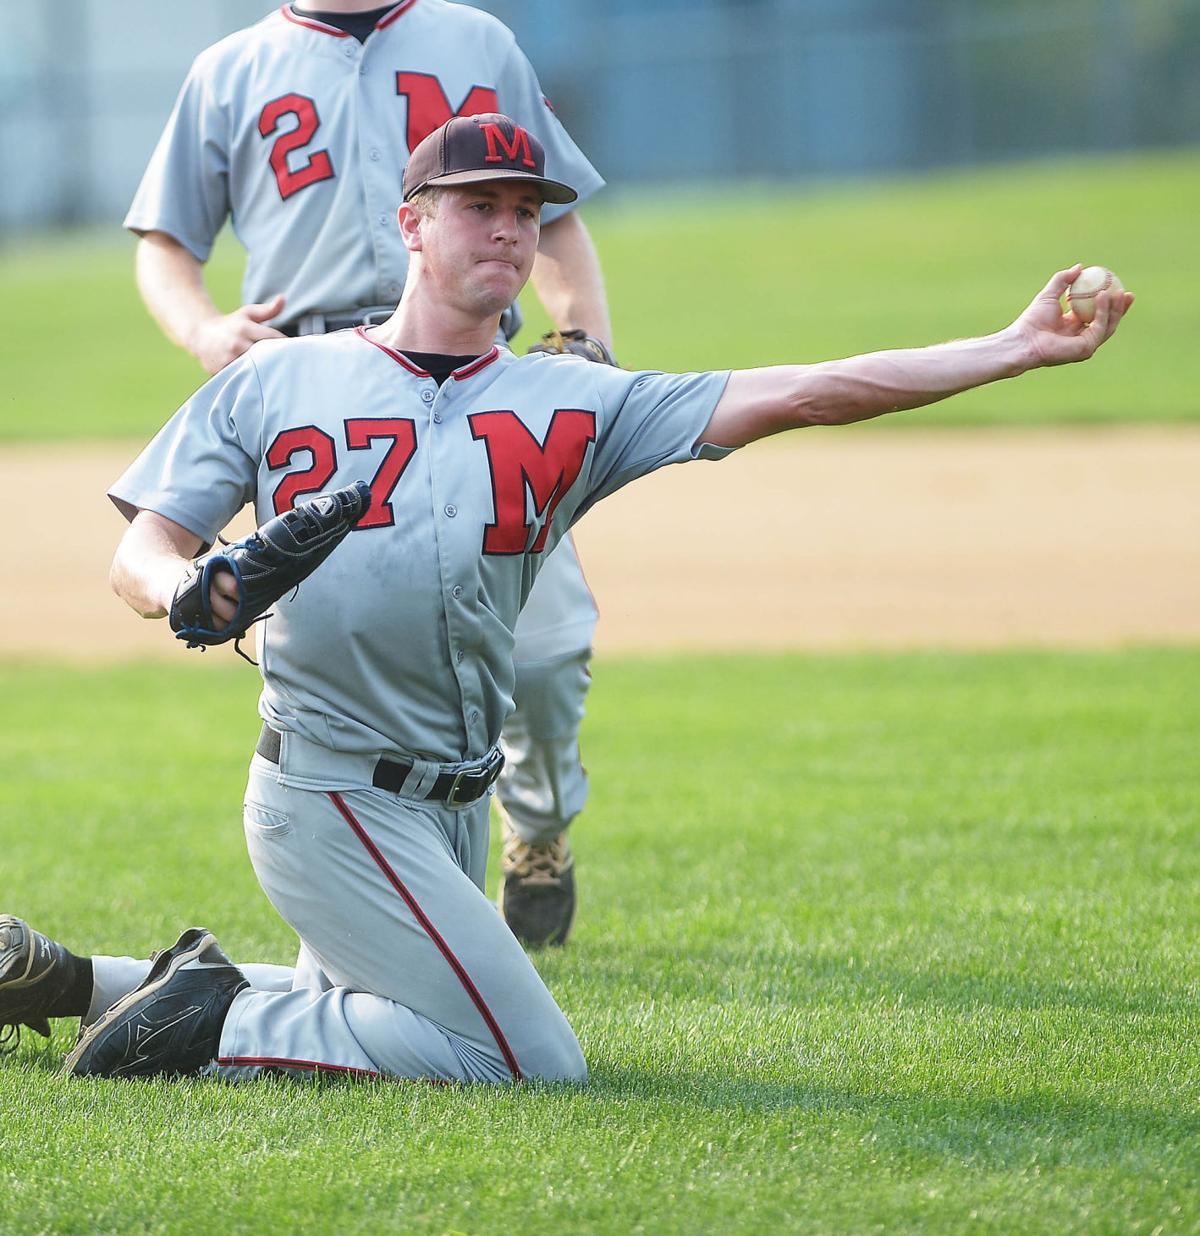 West Shore Twilight League: Mechanicsburg vs Enola